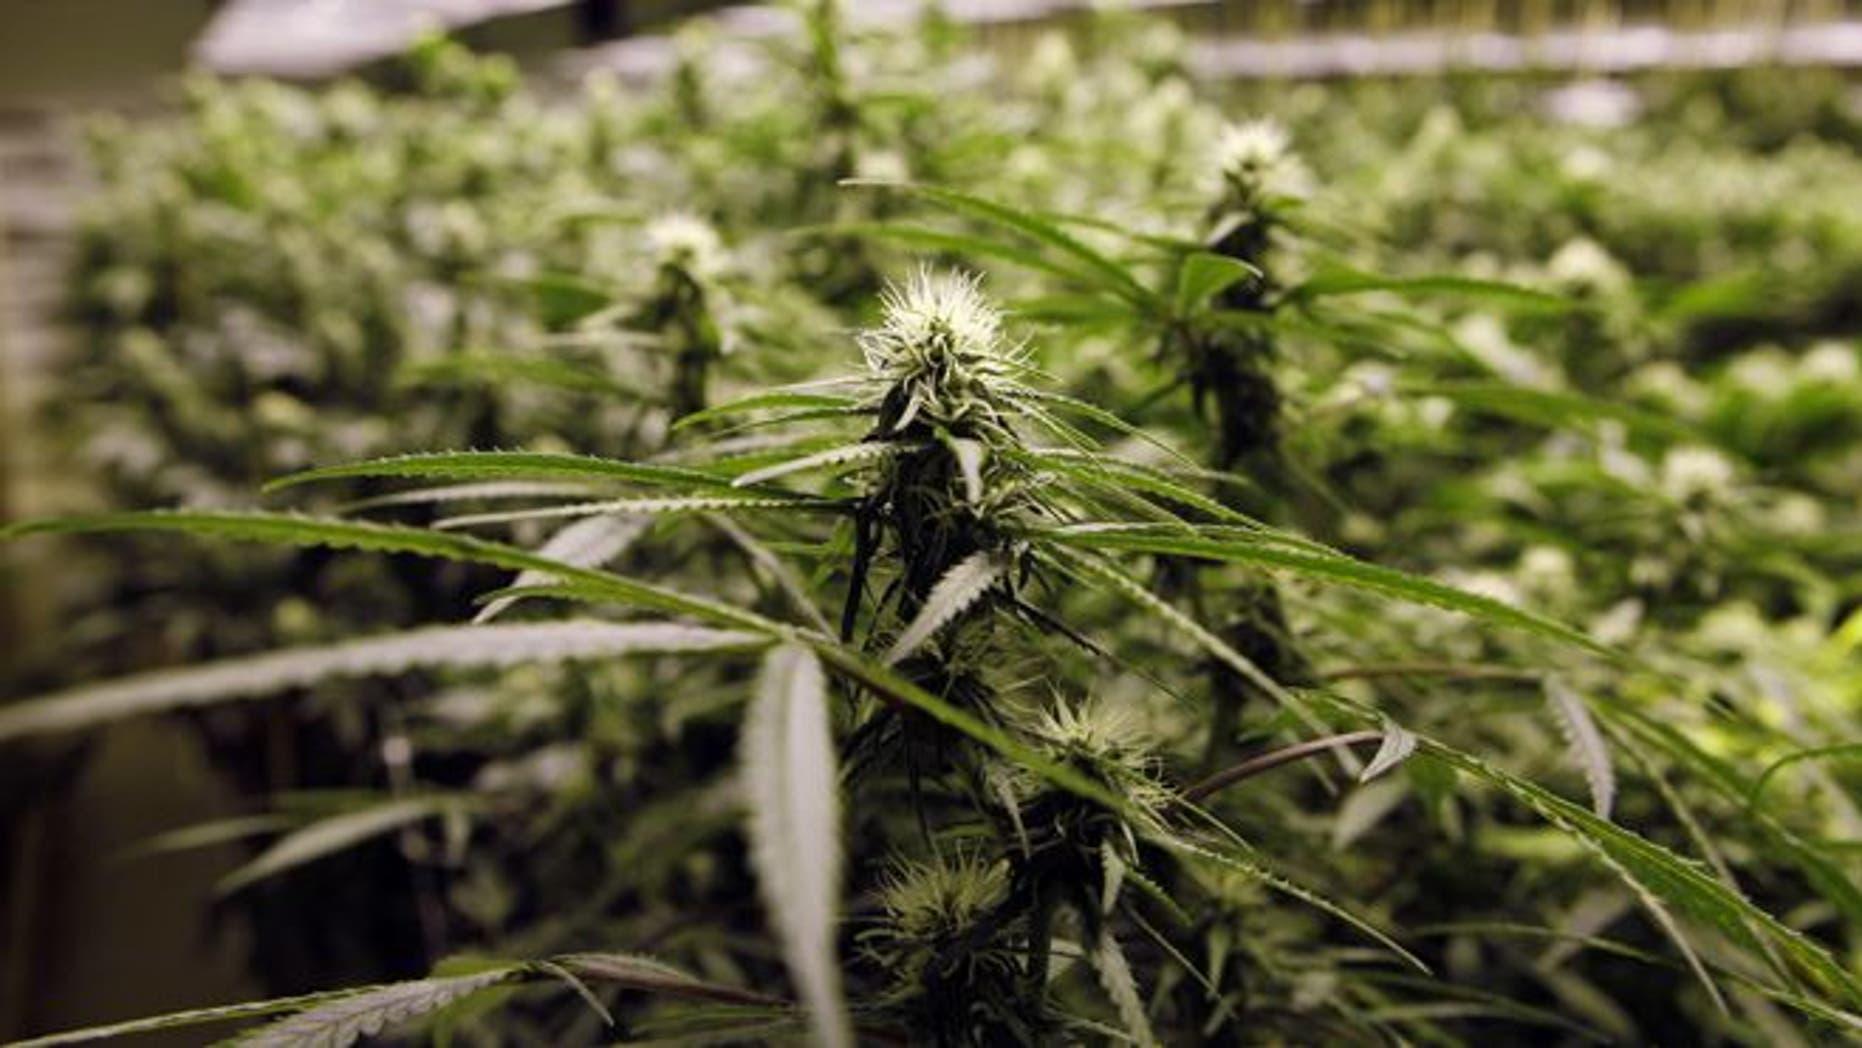 FILE: Nov. 8, 2012: Marijuana plants flourish under the lights at a grow house in Denver.